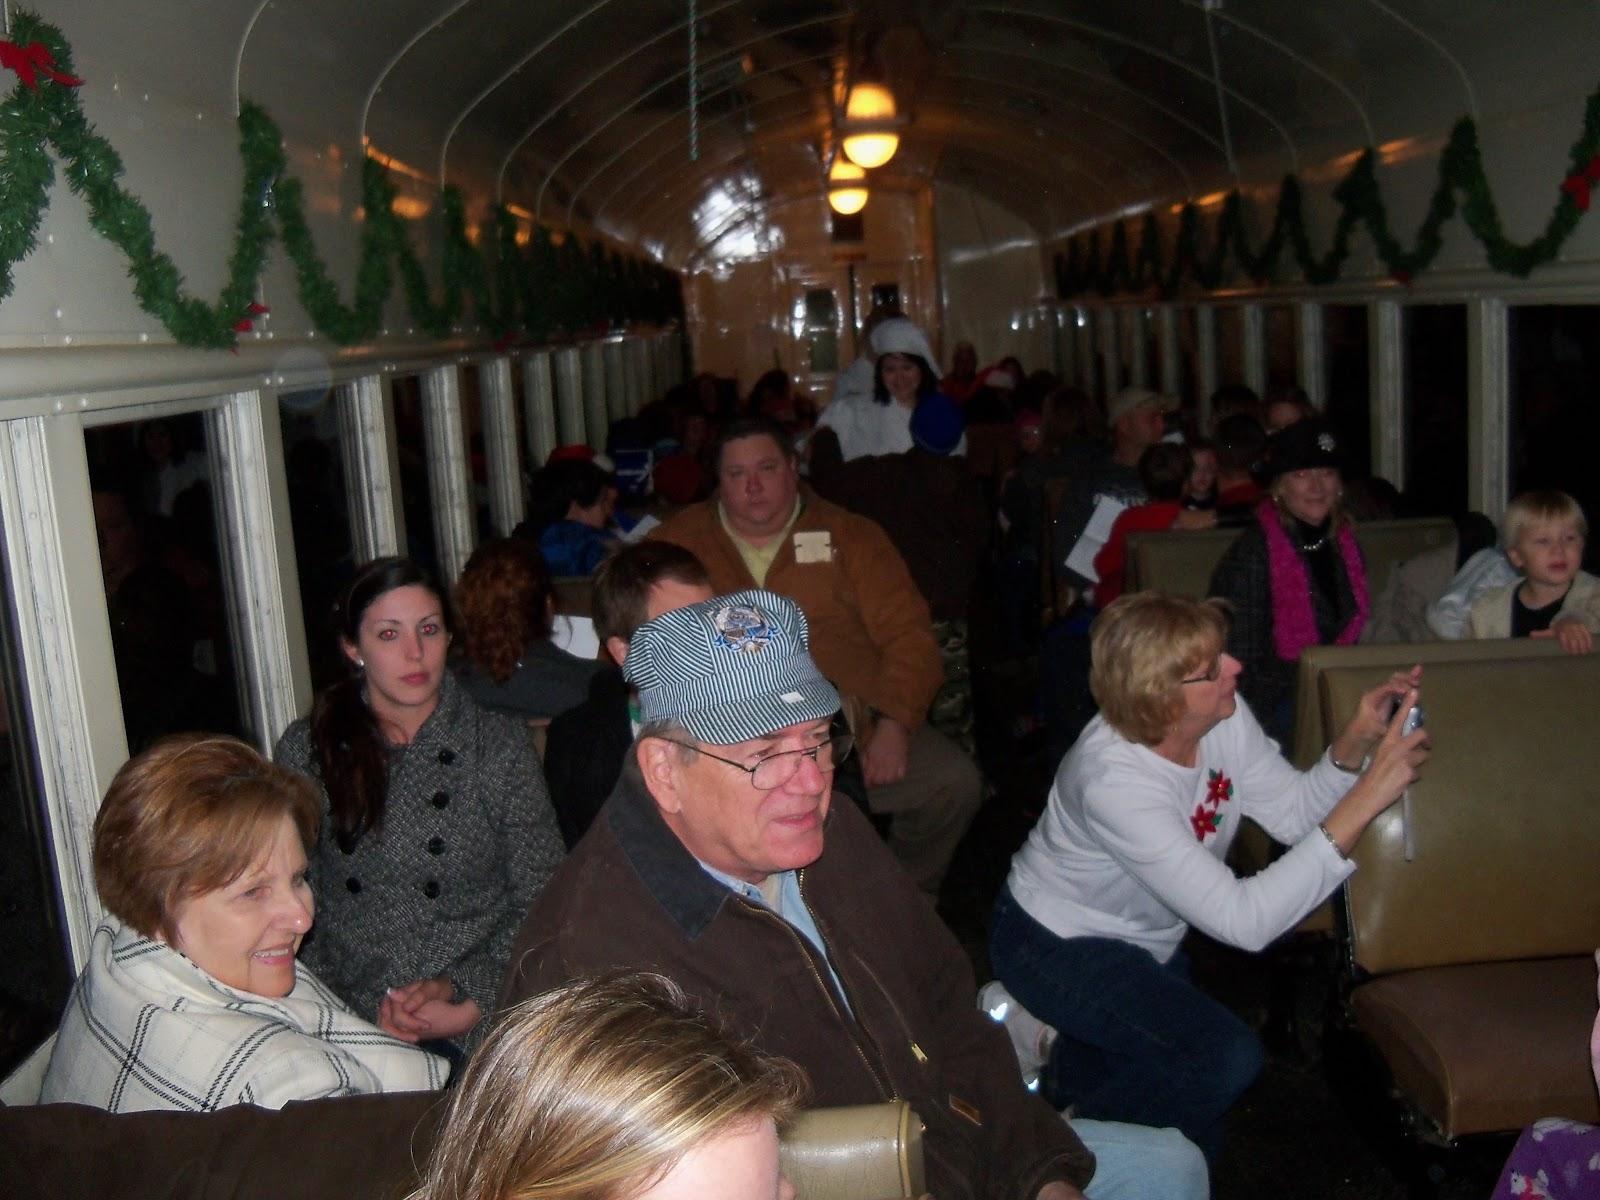 Polar Express Christmas Train 2010 - 100_6304.JPG